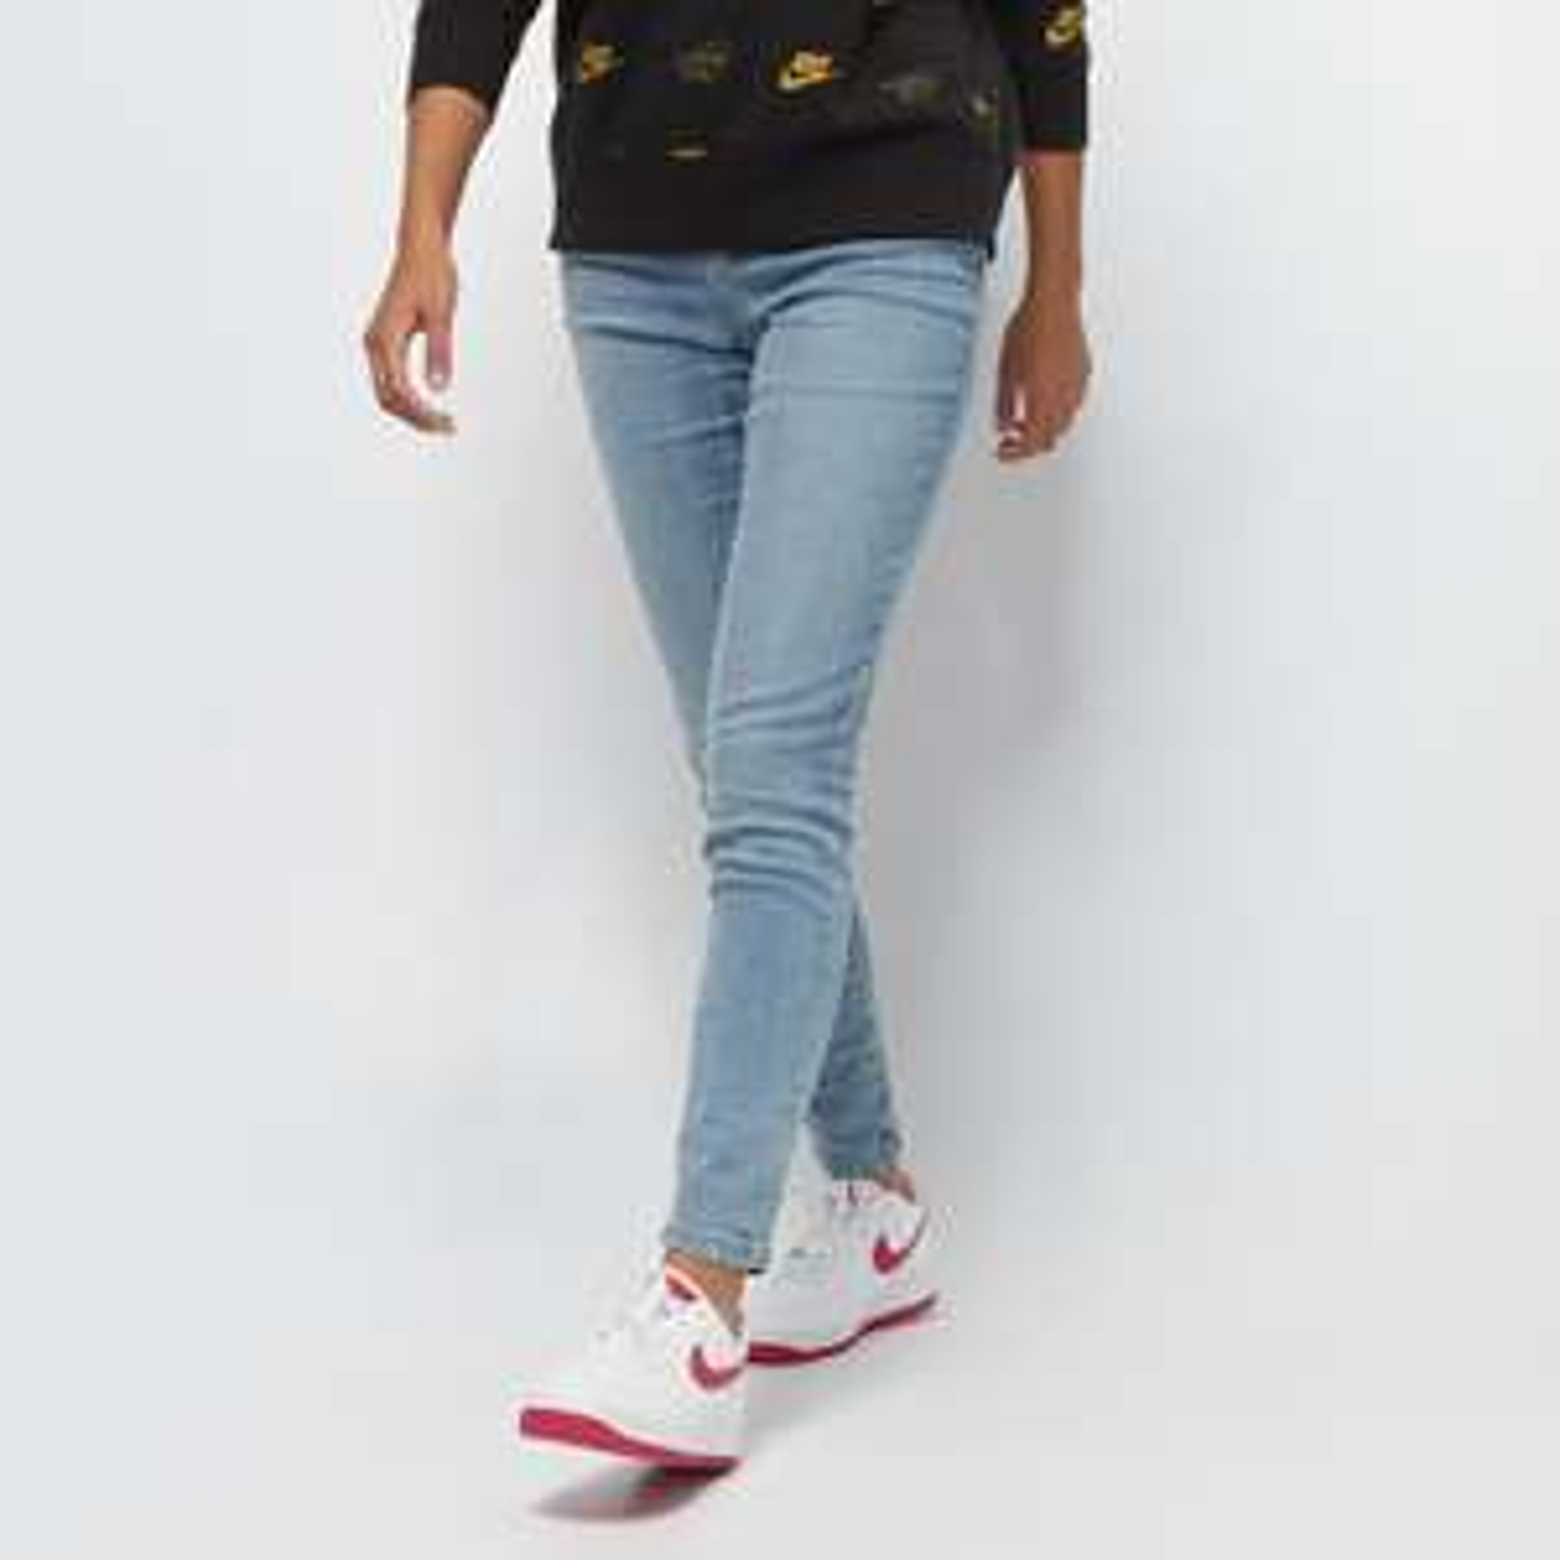 Urban Classics dames slim jeans (26/32, 28/32)